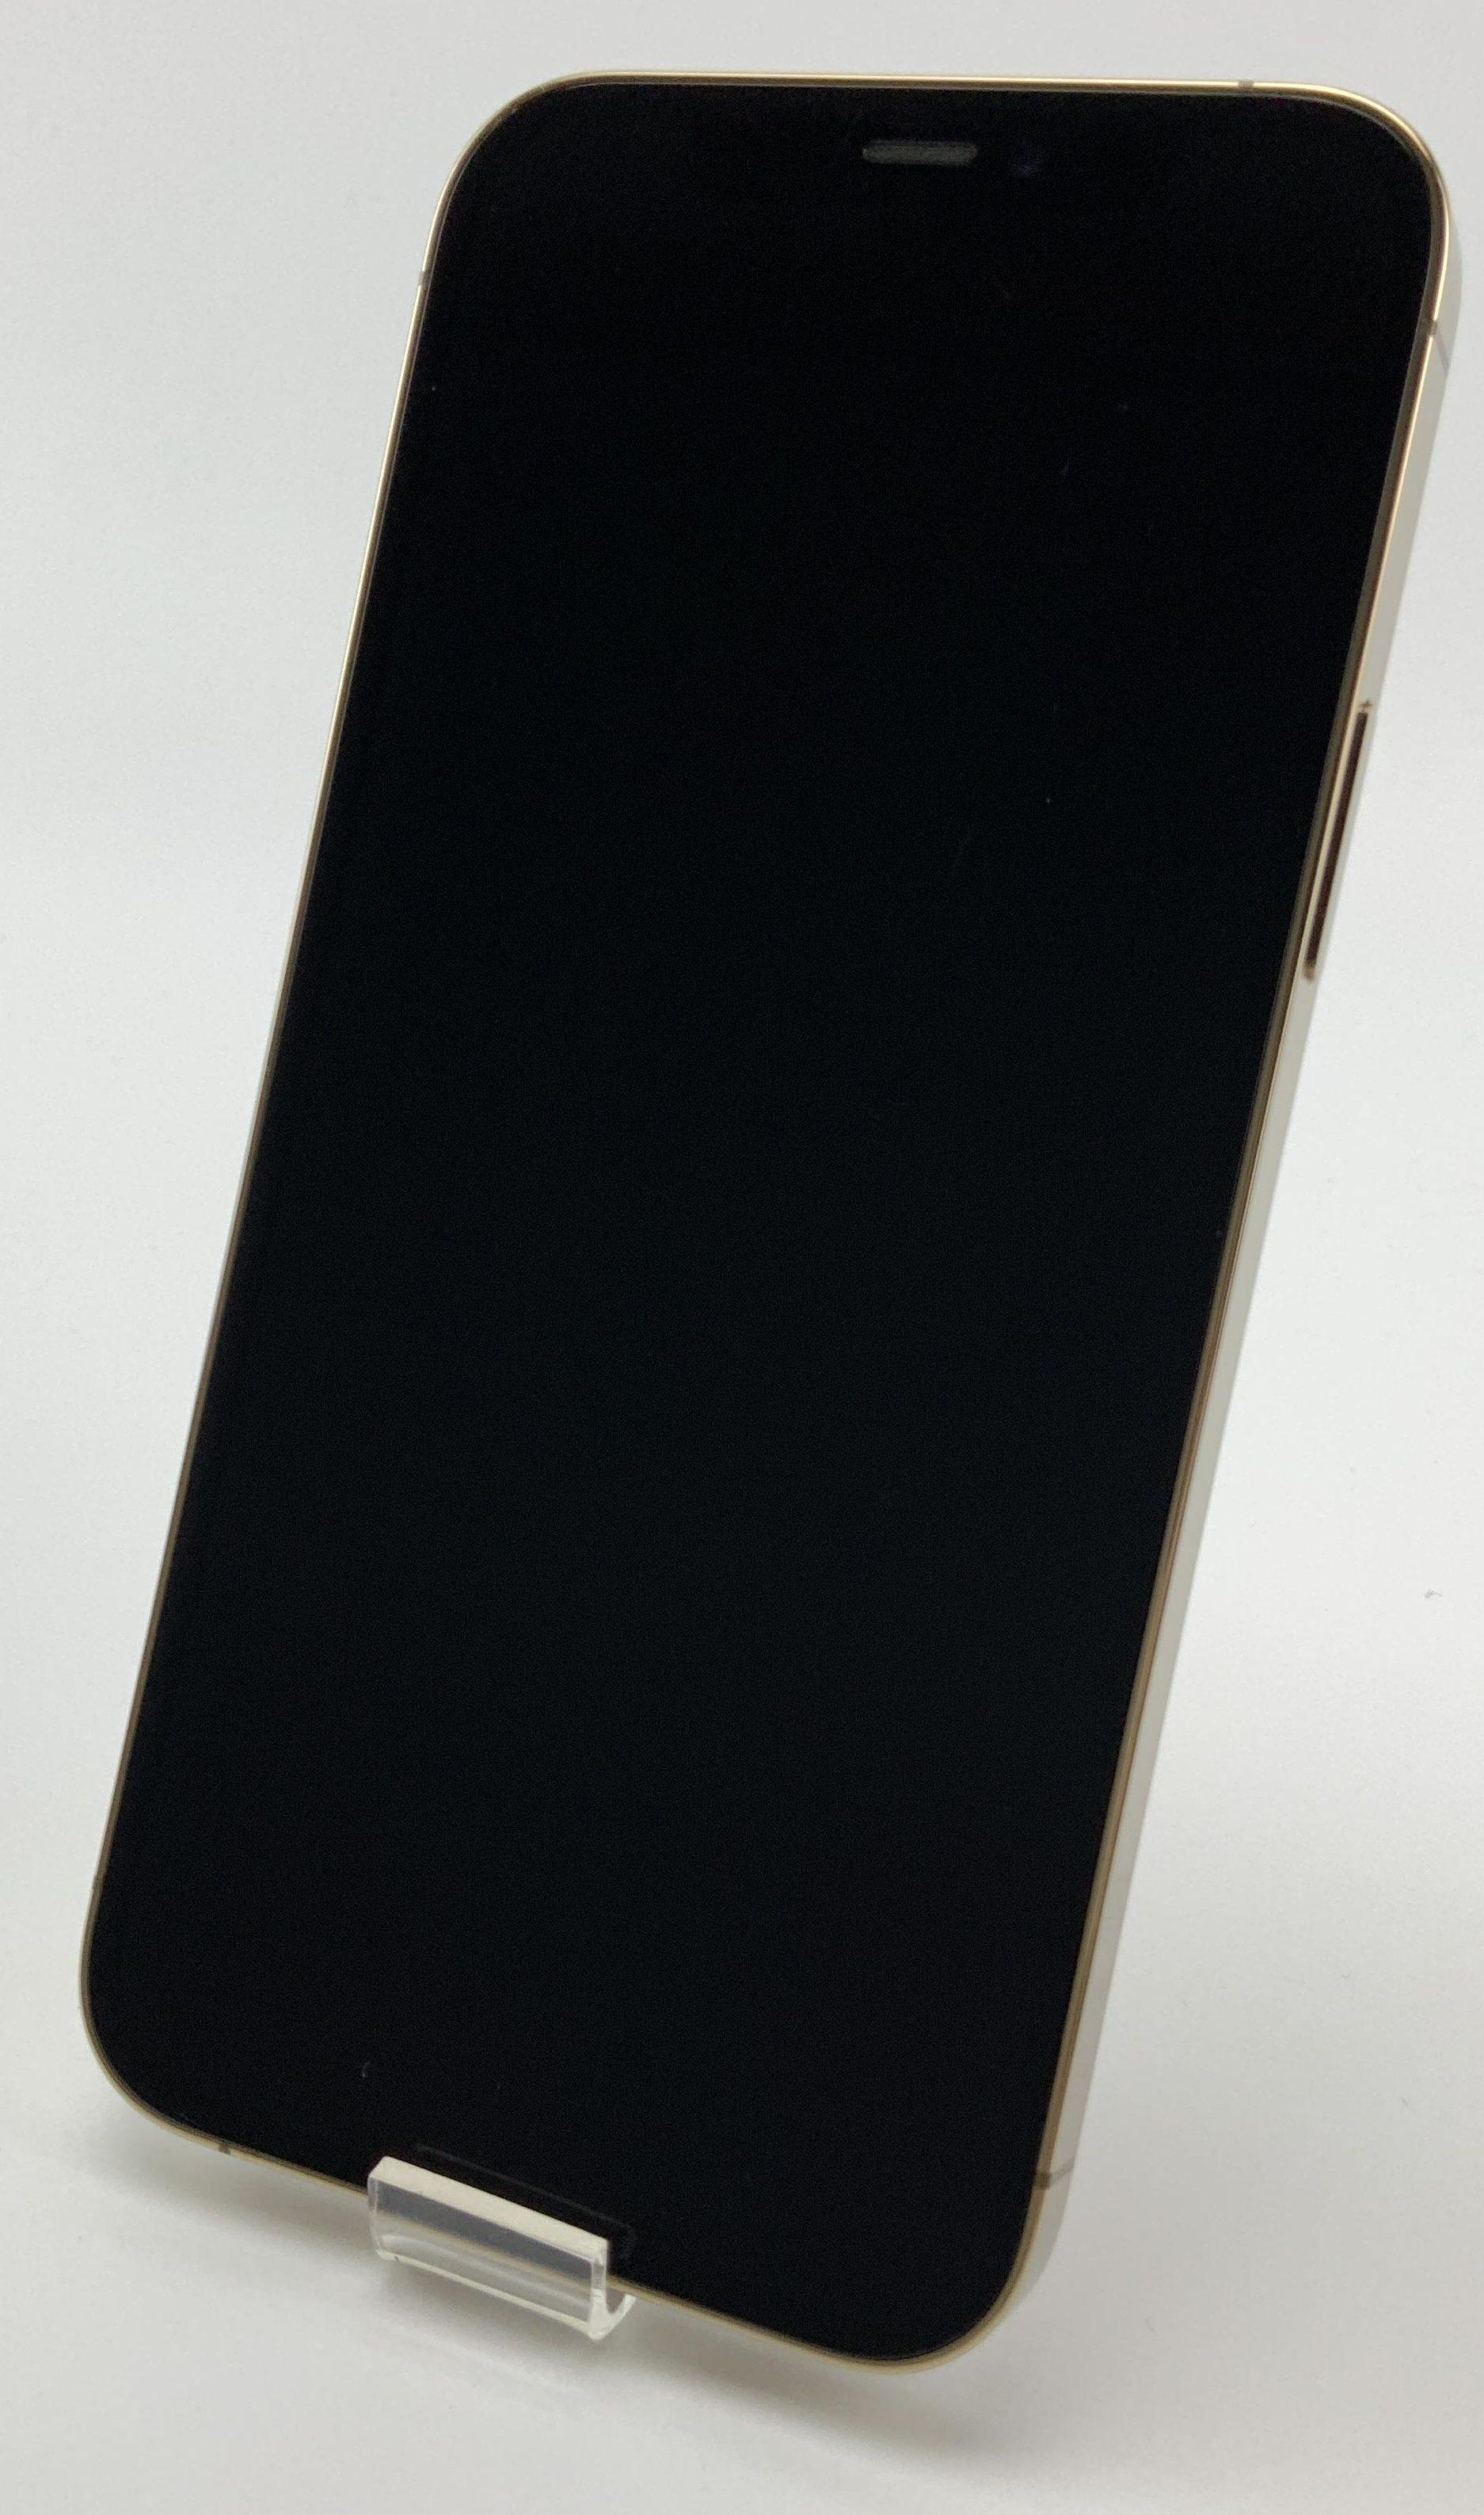 iPhone 12 Pro 128GB, 128GB, Gold, Bild 1